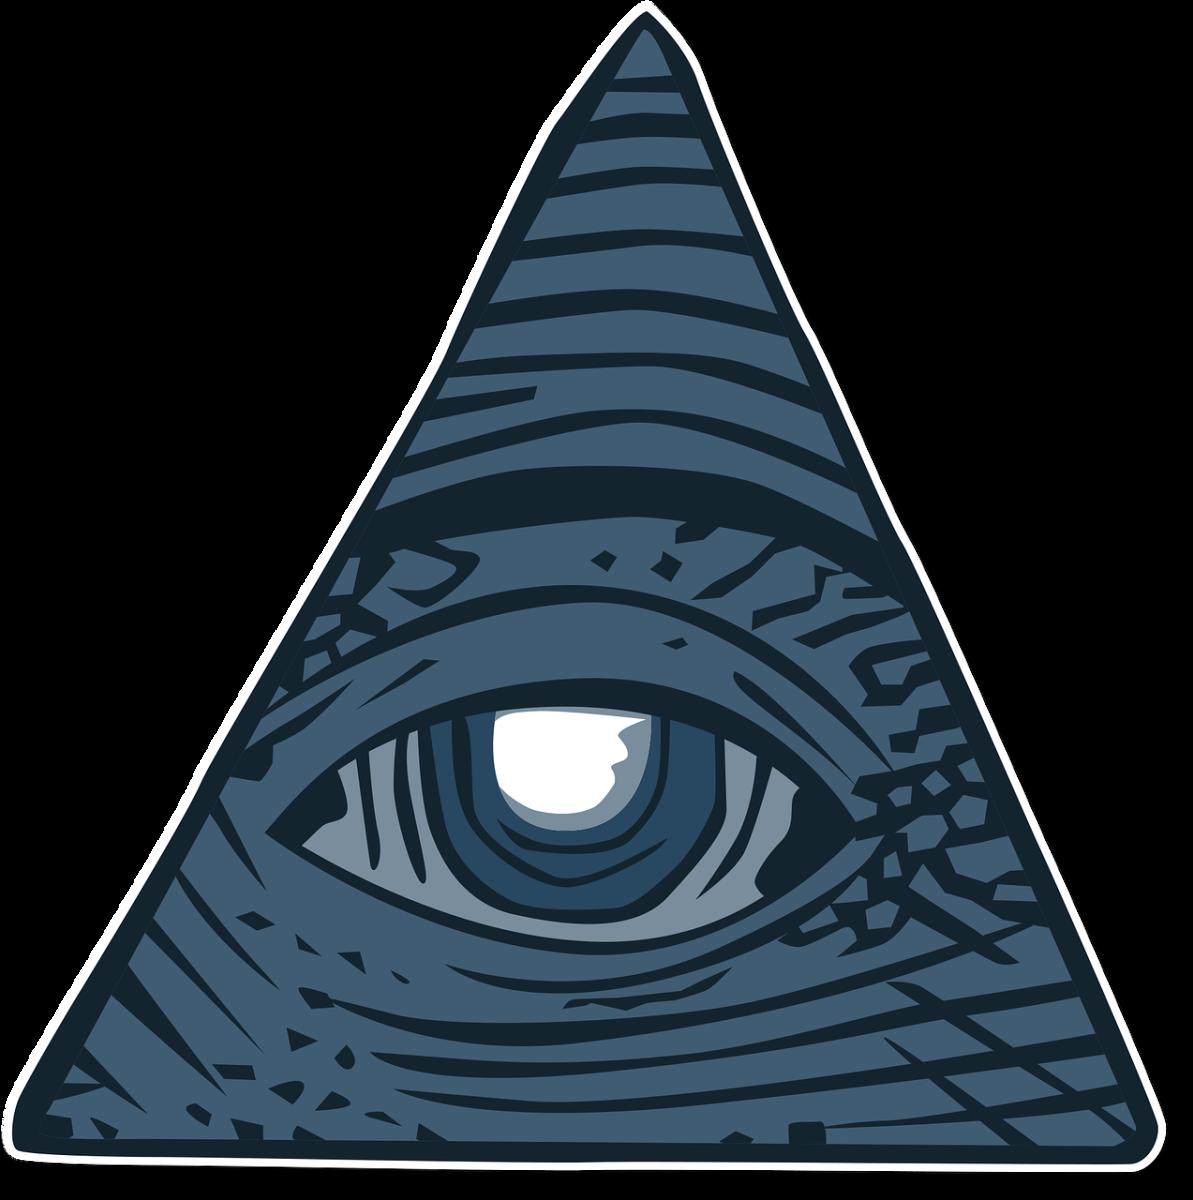 The Real Truth About Illuminati-part 2